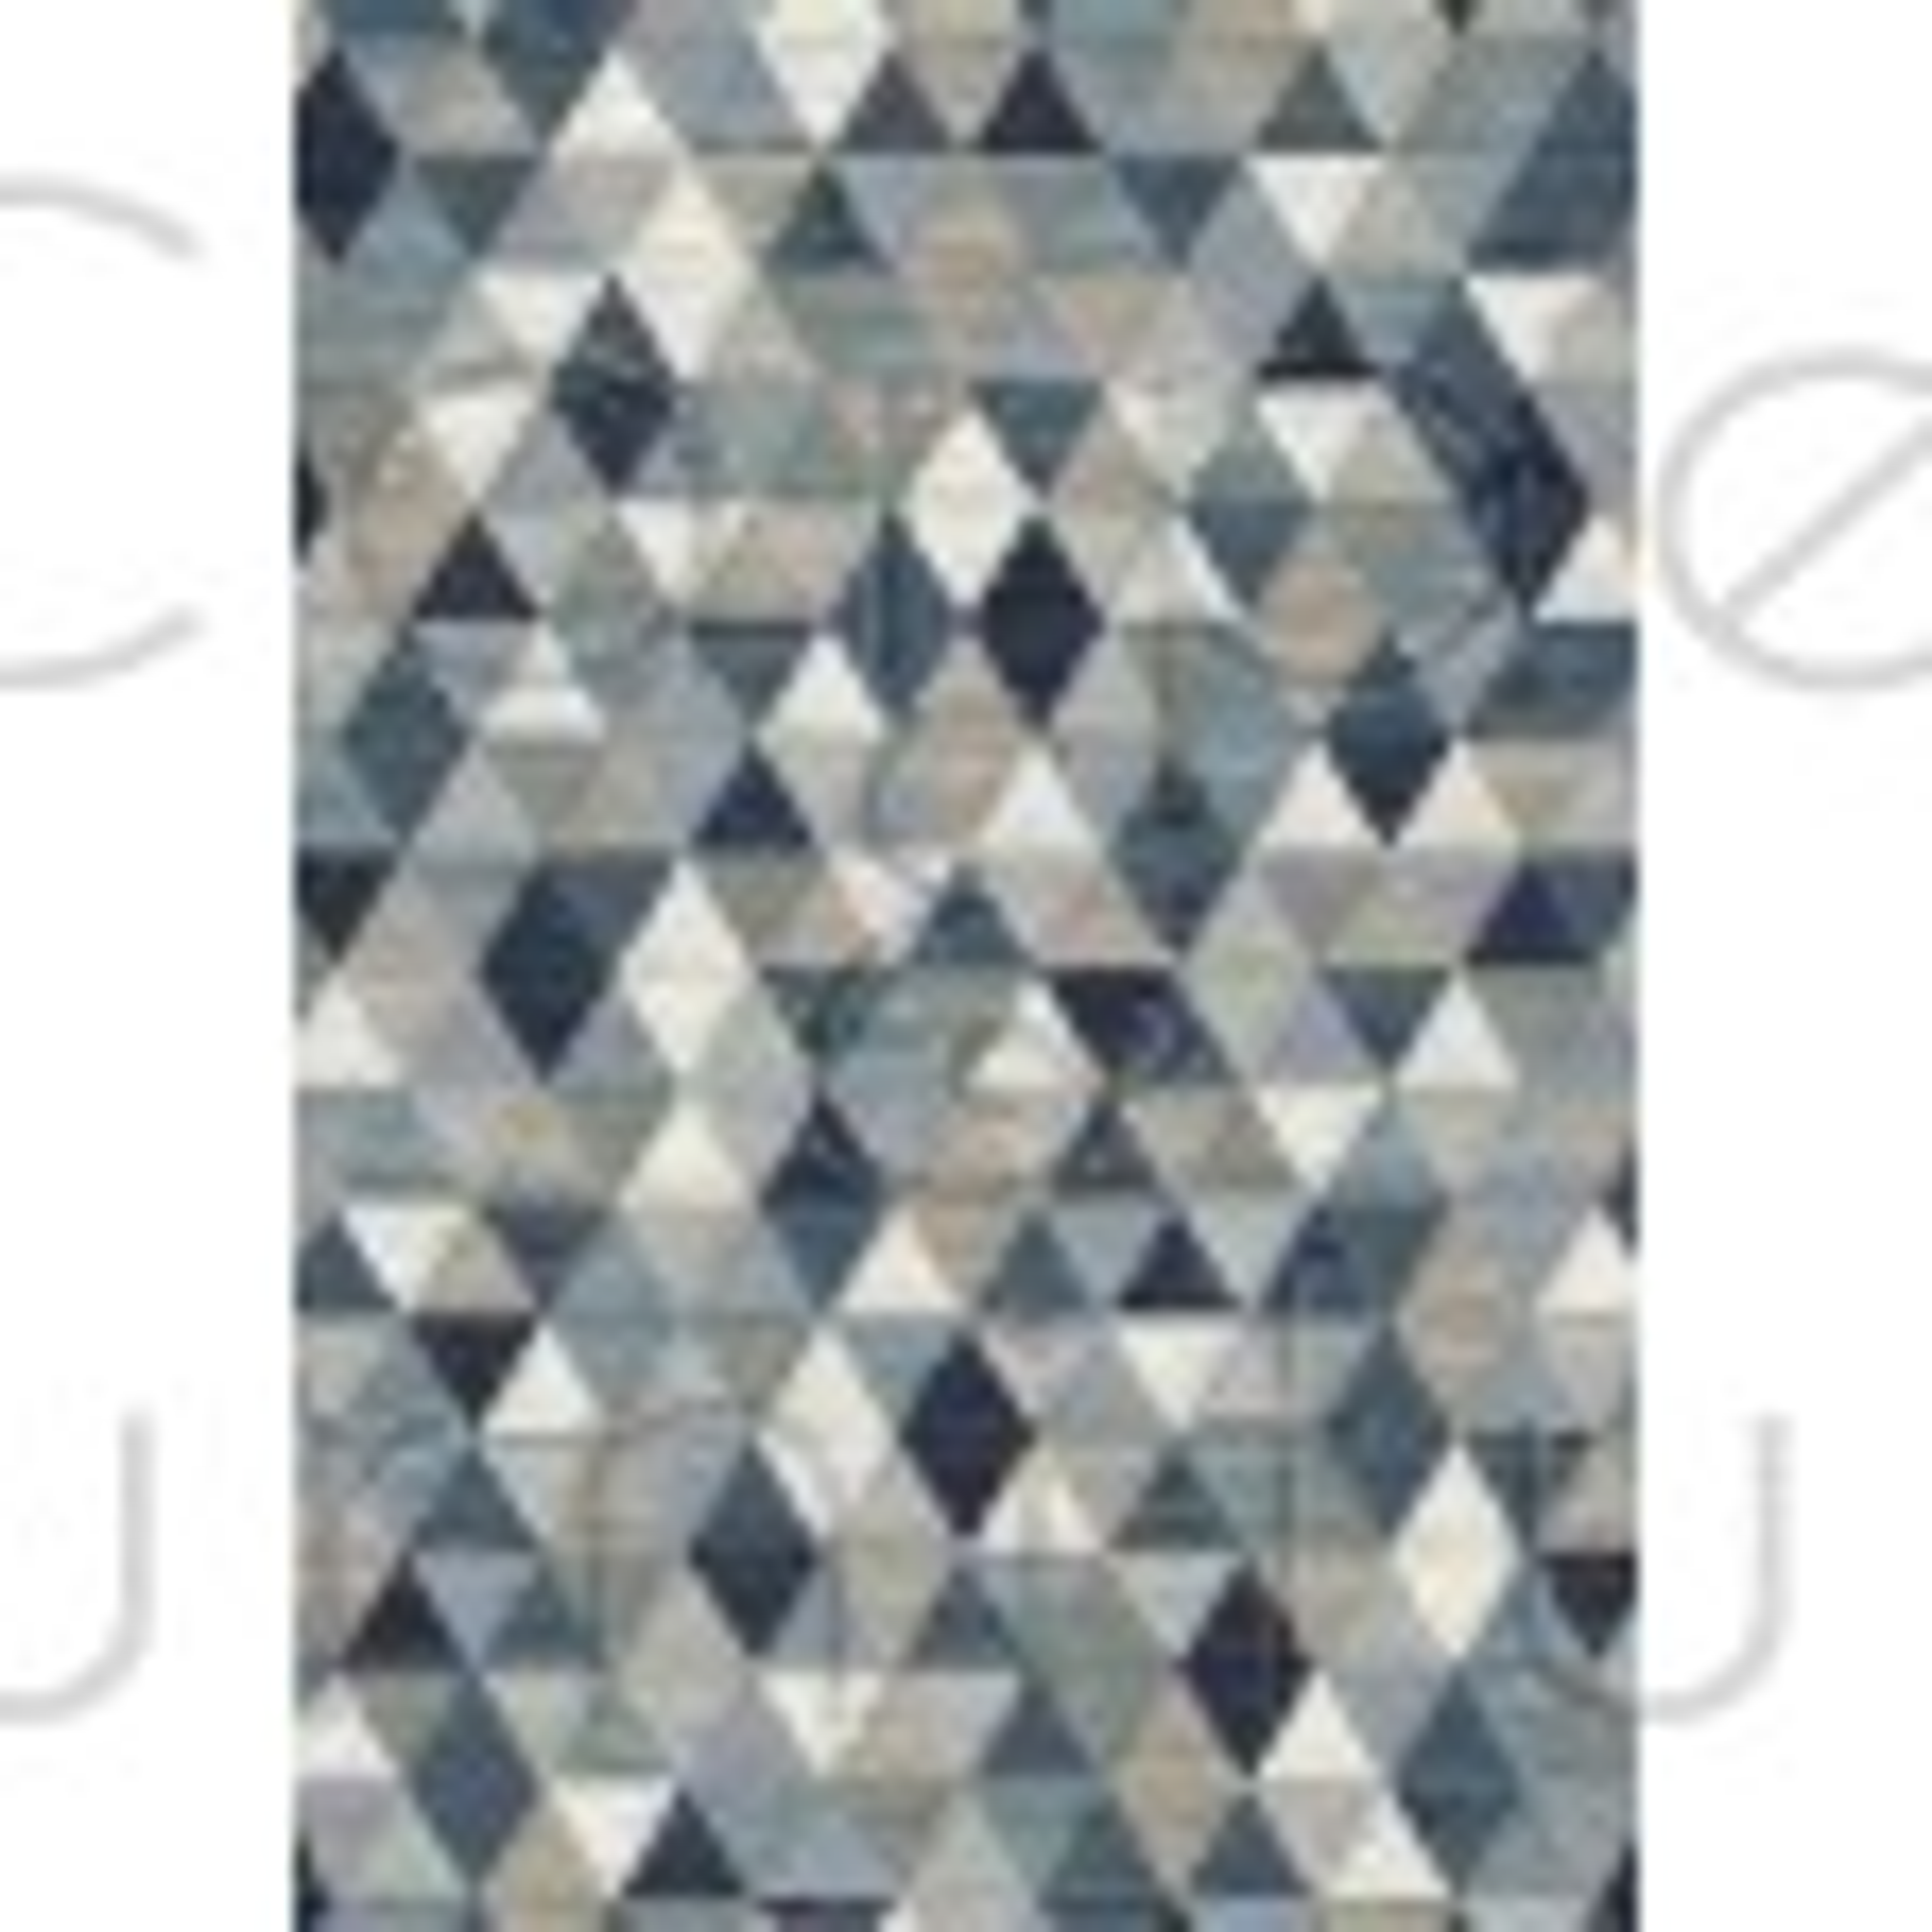 "Galleria Rug - Triangles 63263 5161 - Size 120 x 170 cm (4' x 5'7"")"